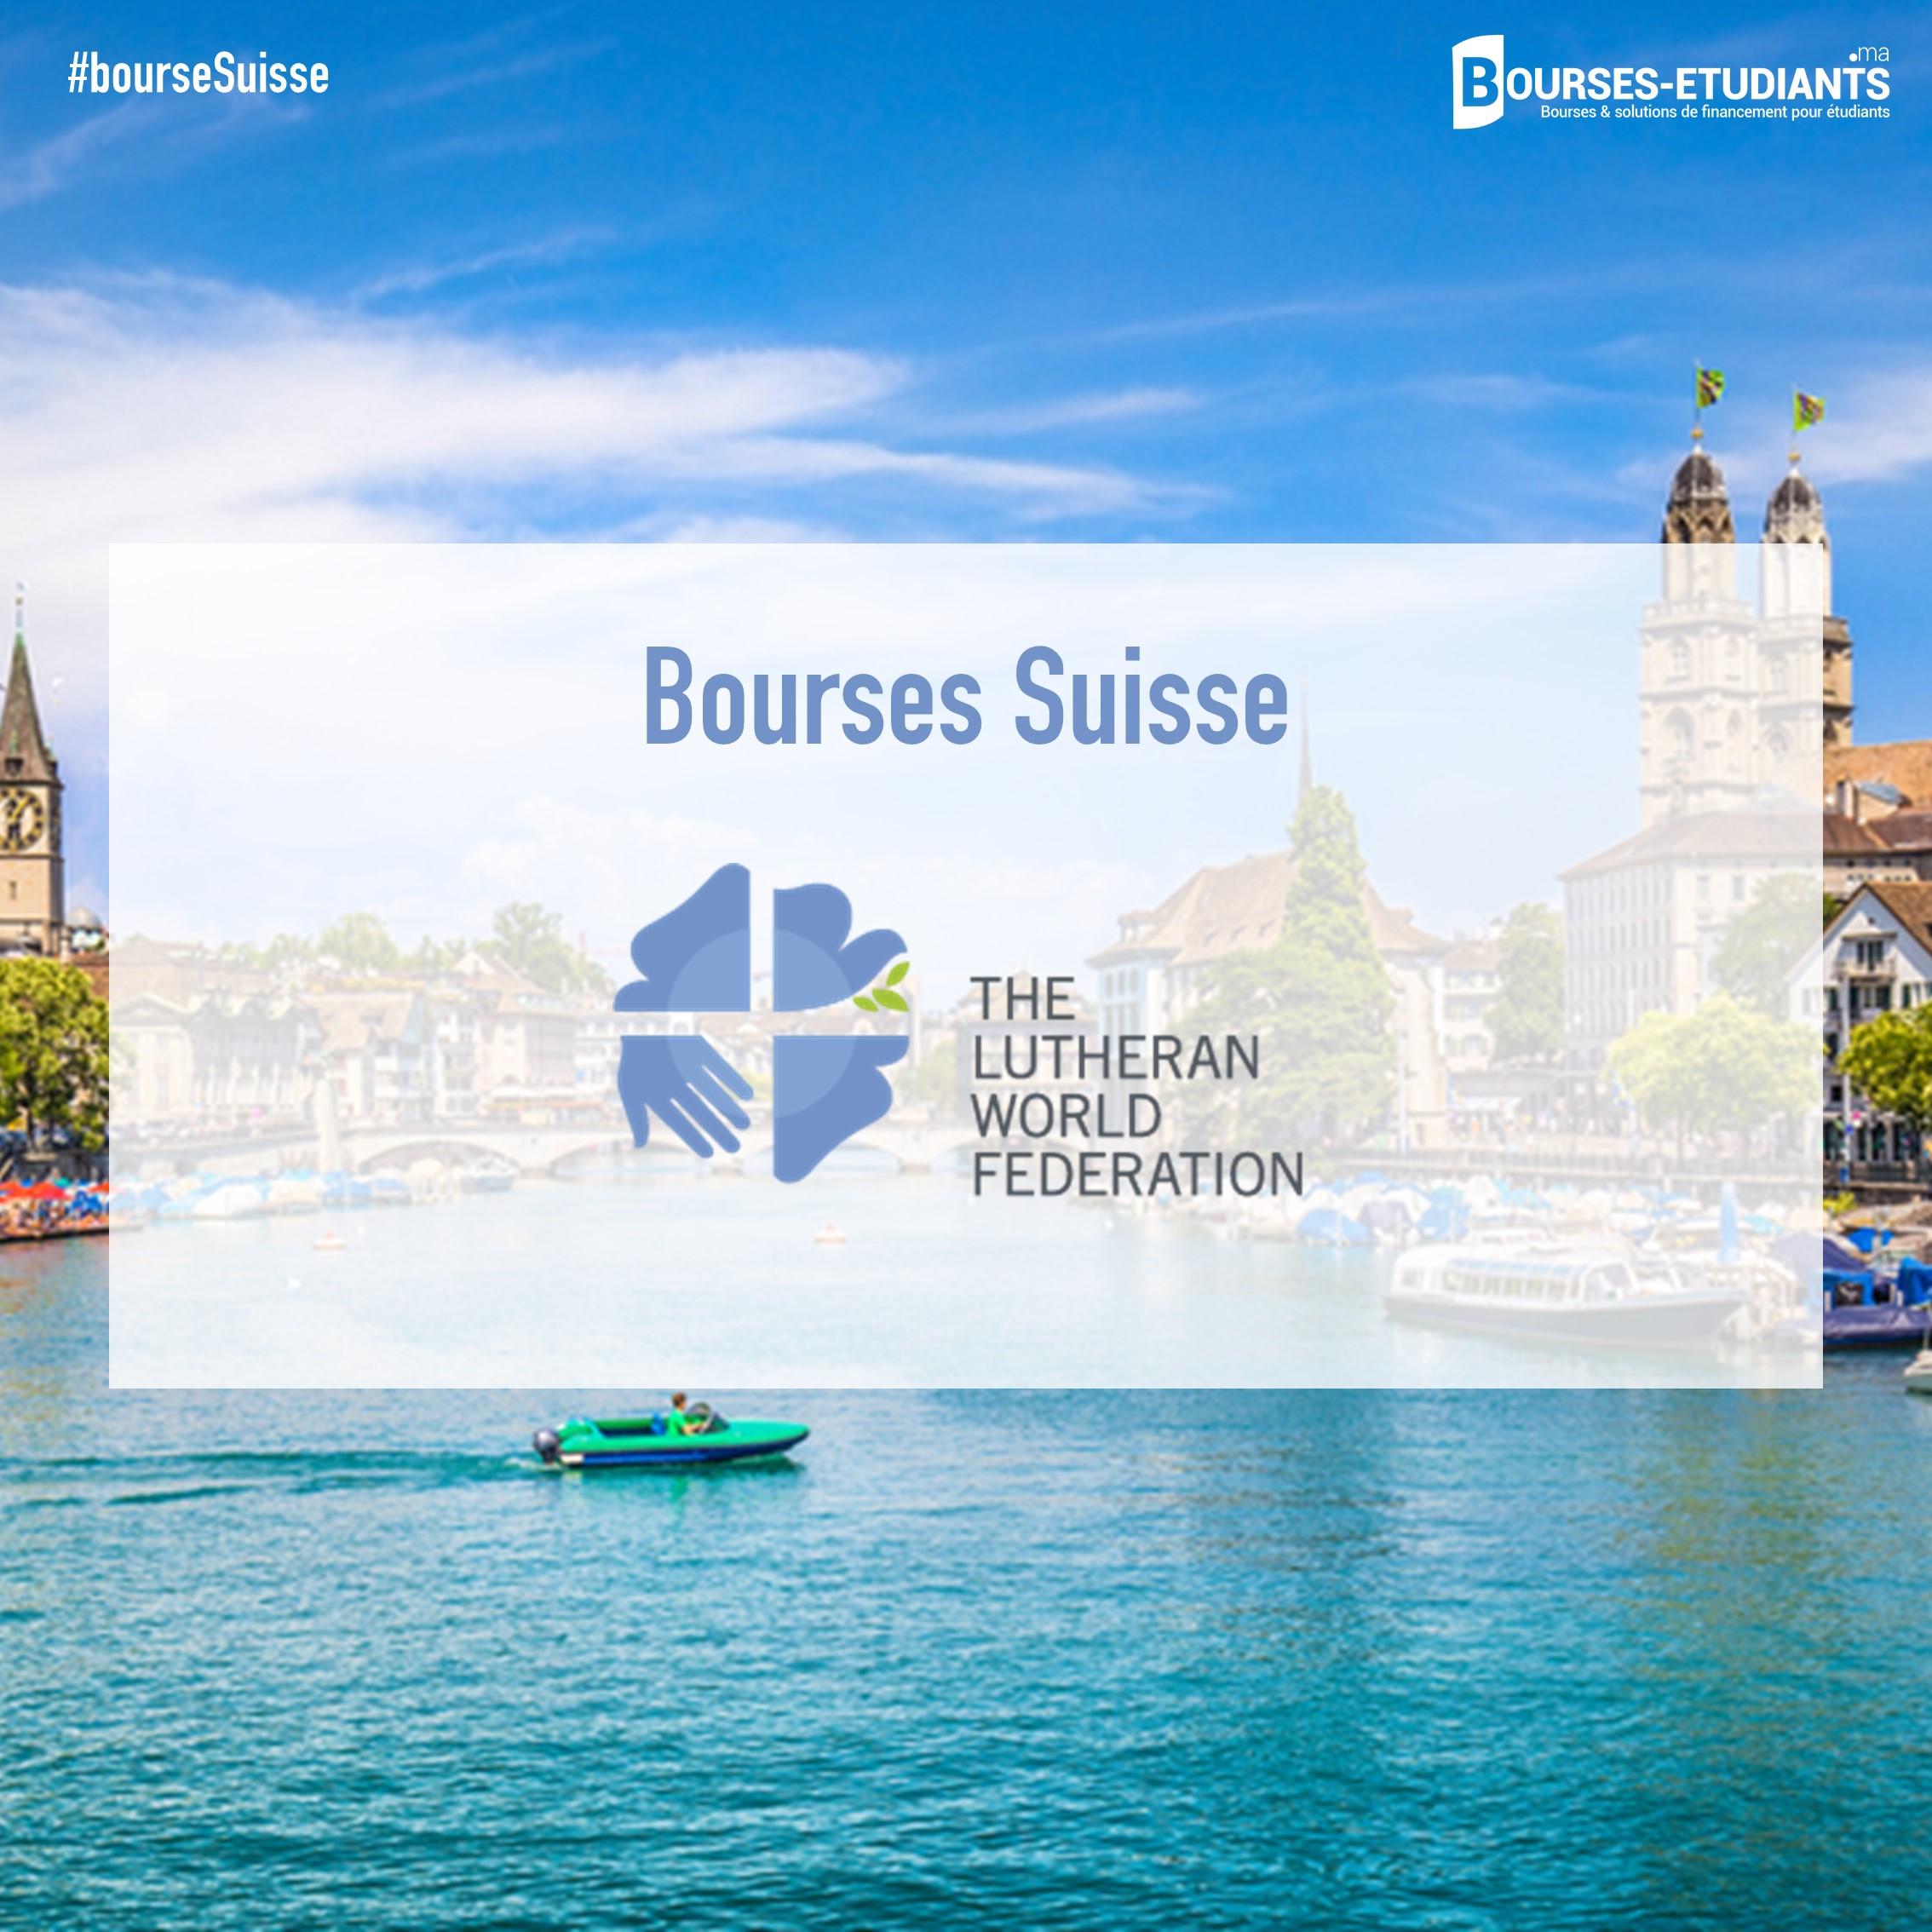 Bourses Suisse